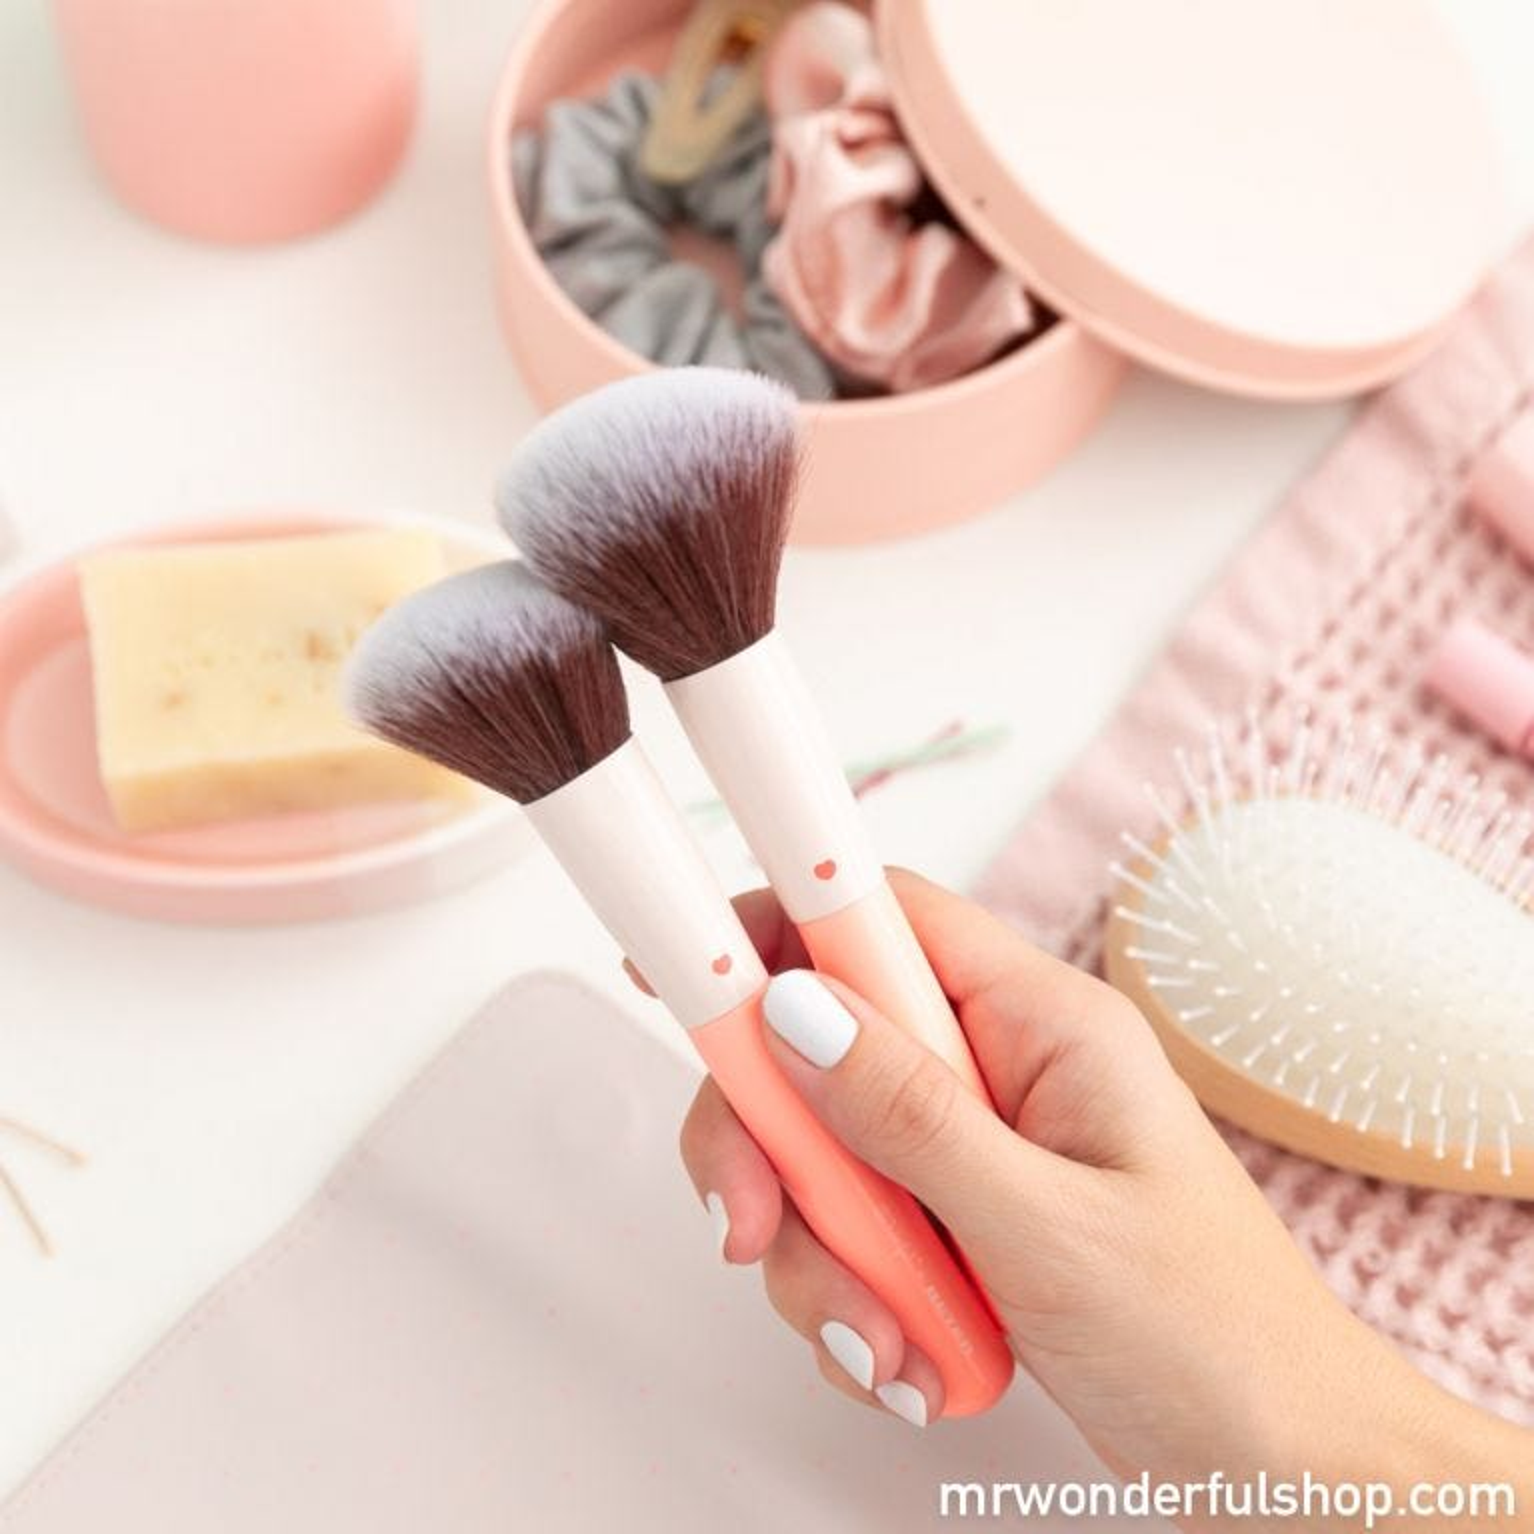 Makeup brush set - Some blush and a make-up brush